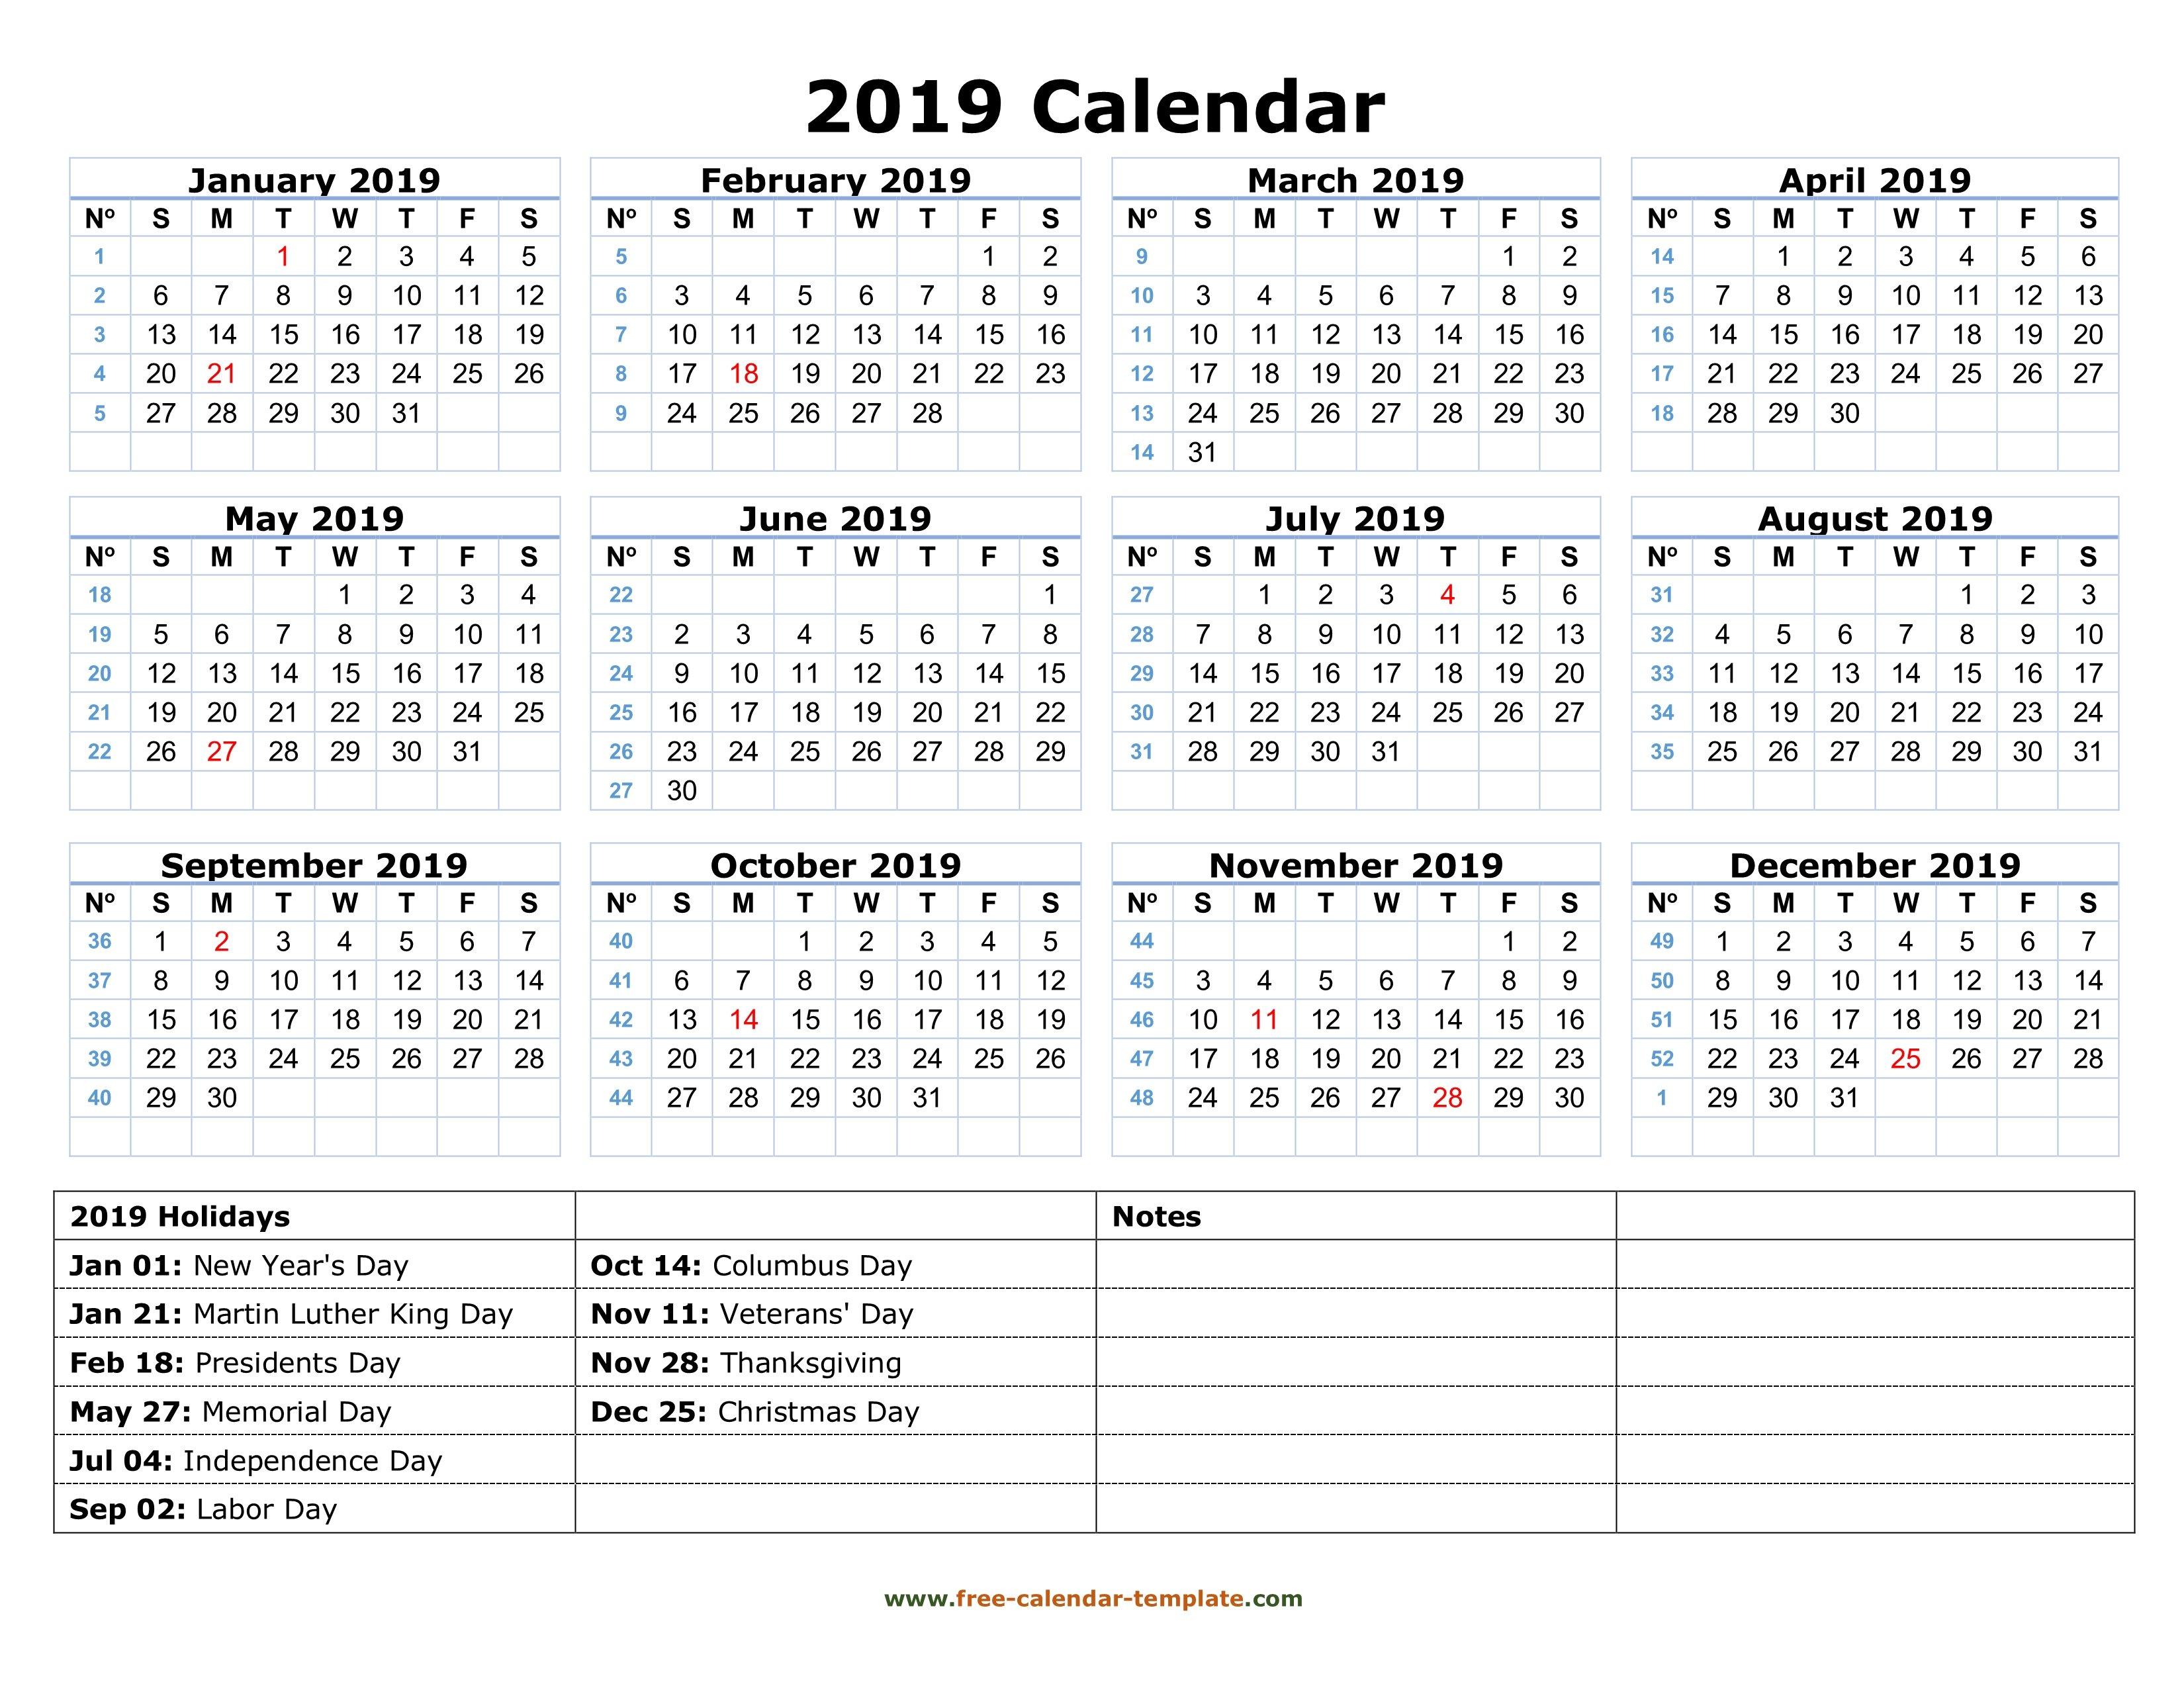 Printable Yearly Calendar 2019 With Us Holidays | Free Calendar Calendar 2019 Presidents Day